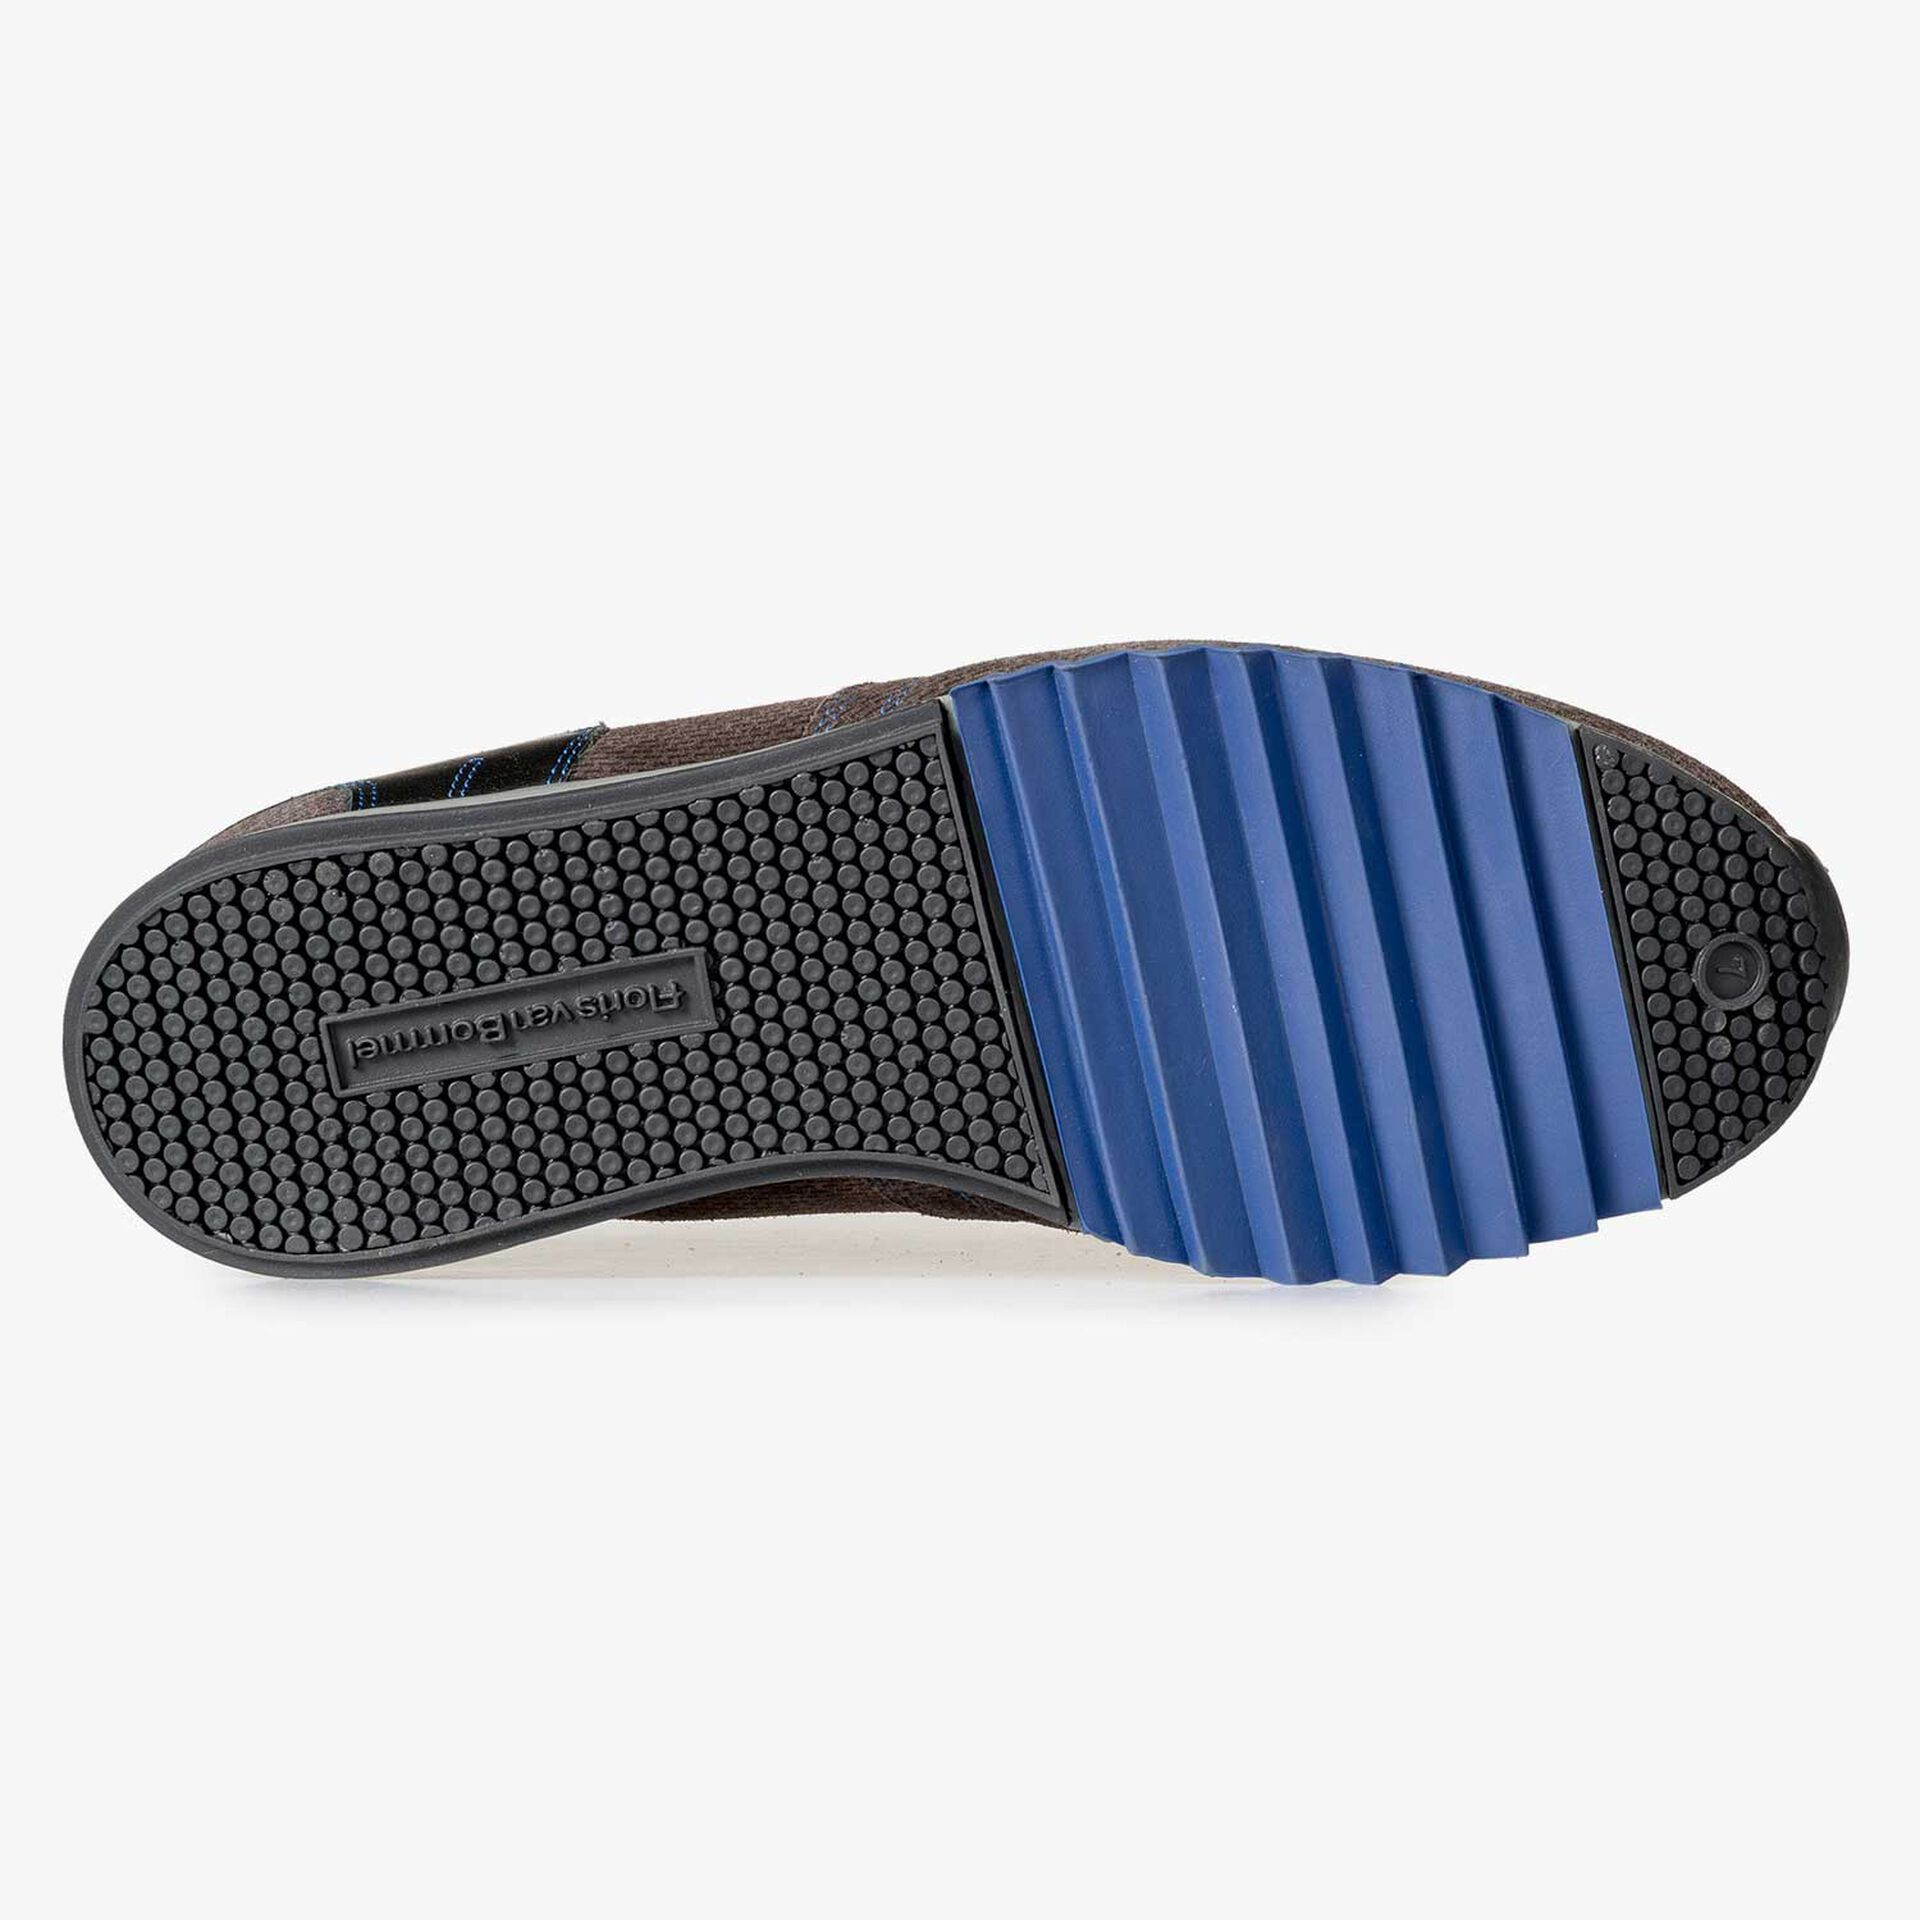 Grey-brown sneaker with cobalt blue details